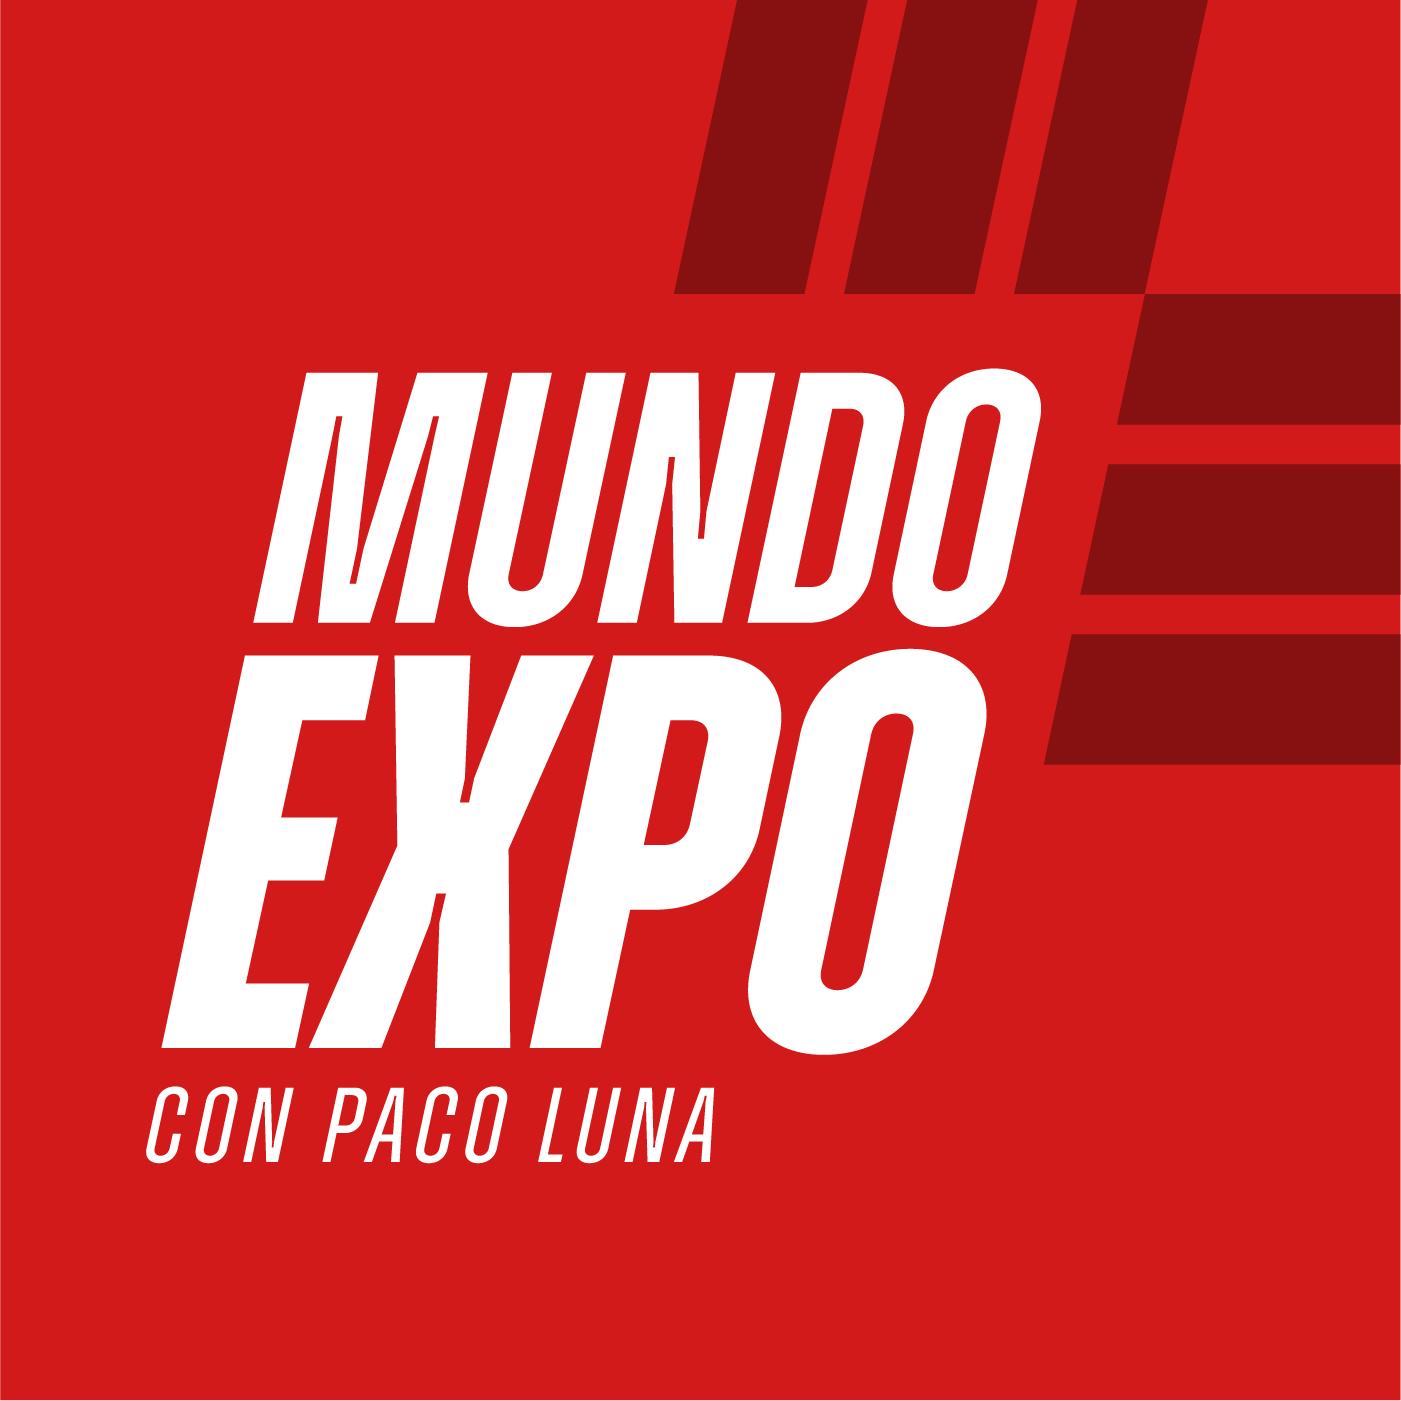 MUNDO EXPO show art